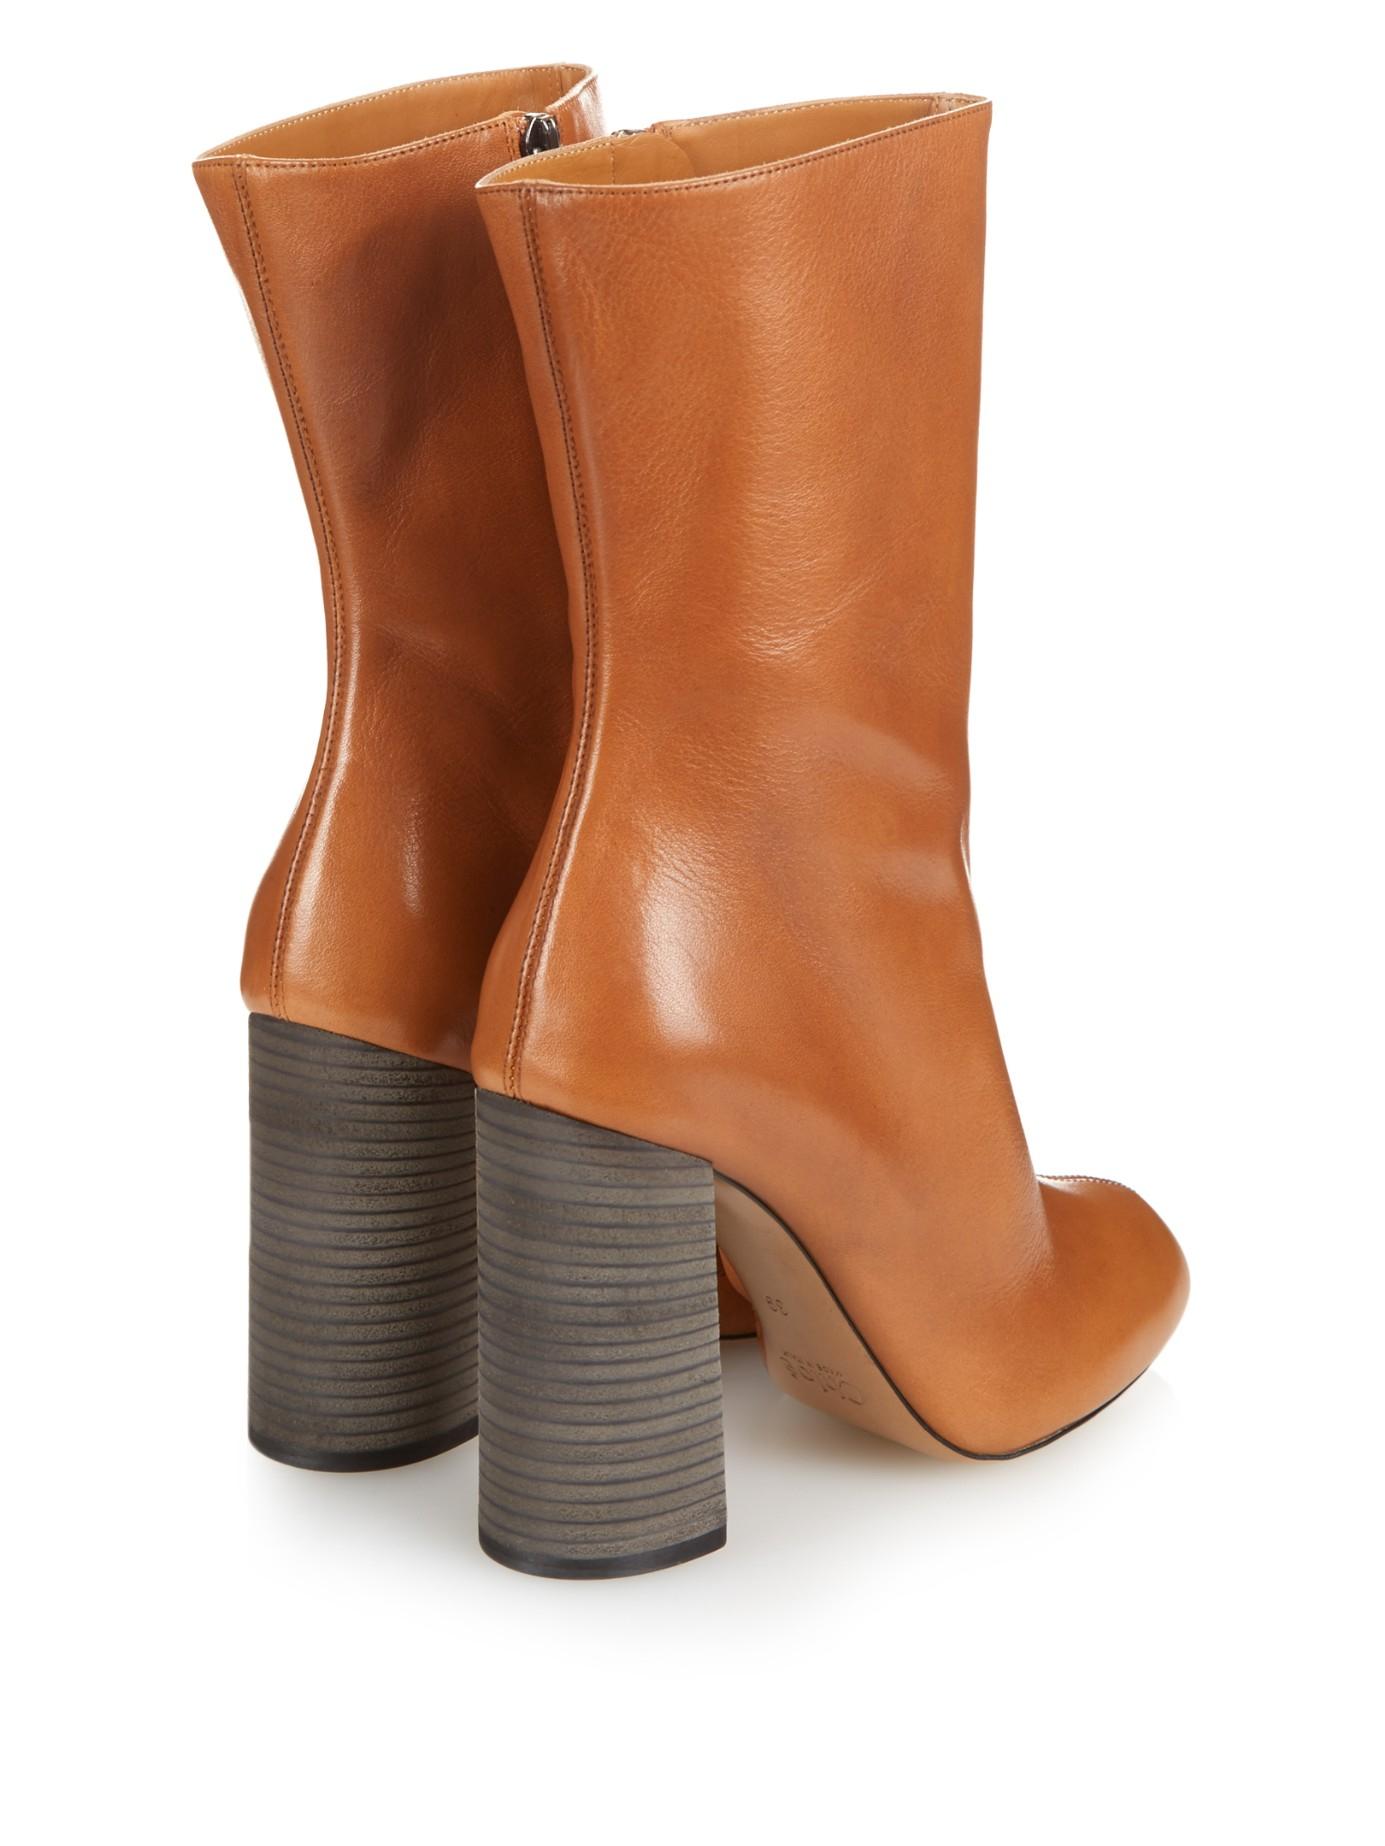 Chloé Harper Mid-Calf Boots clearance shopping online cheap excellent buy cheap 2014 nicekicks online get to buy lqGNNv62Jp